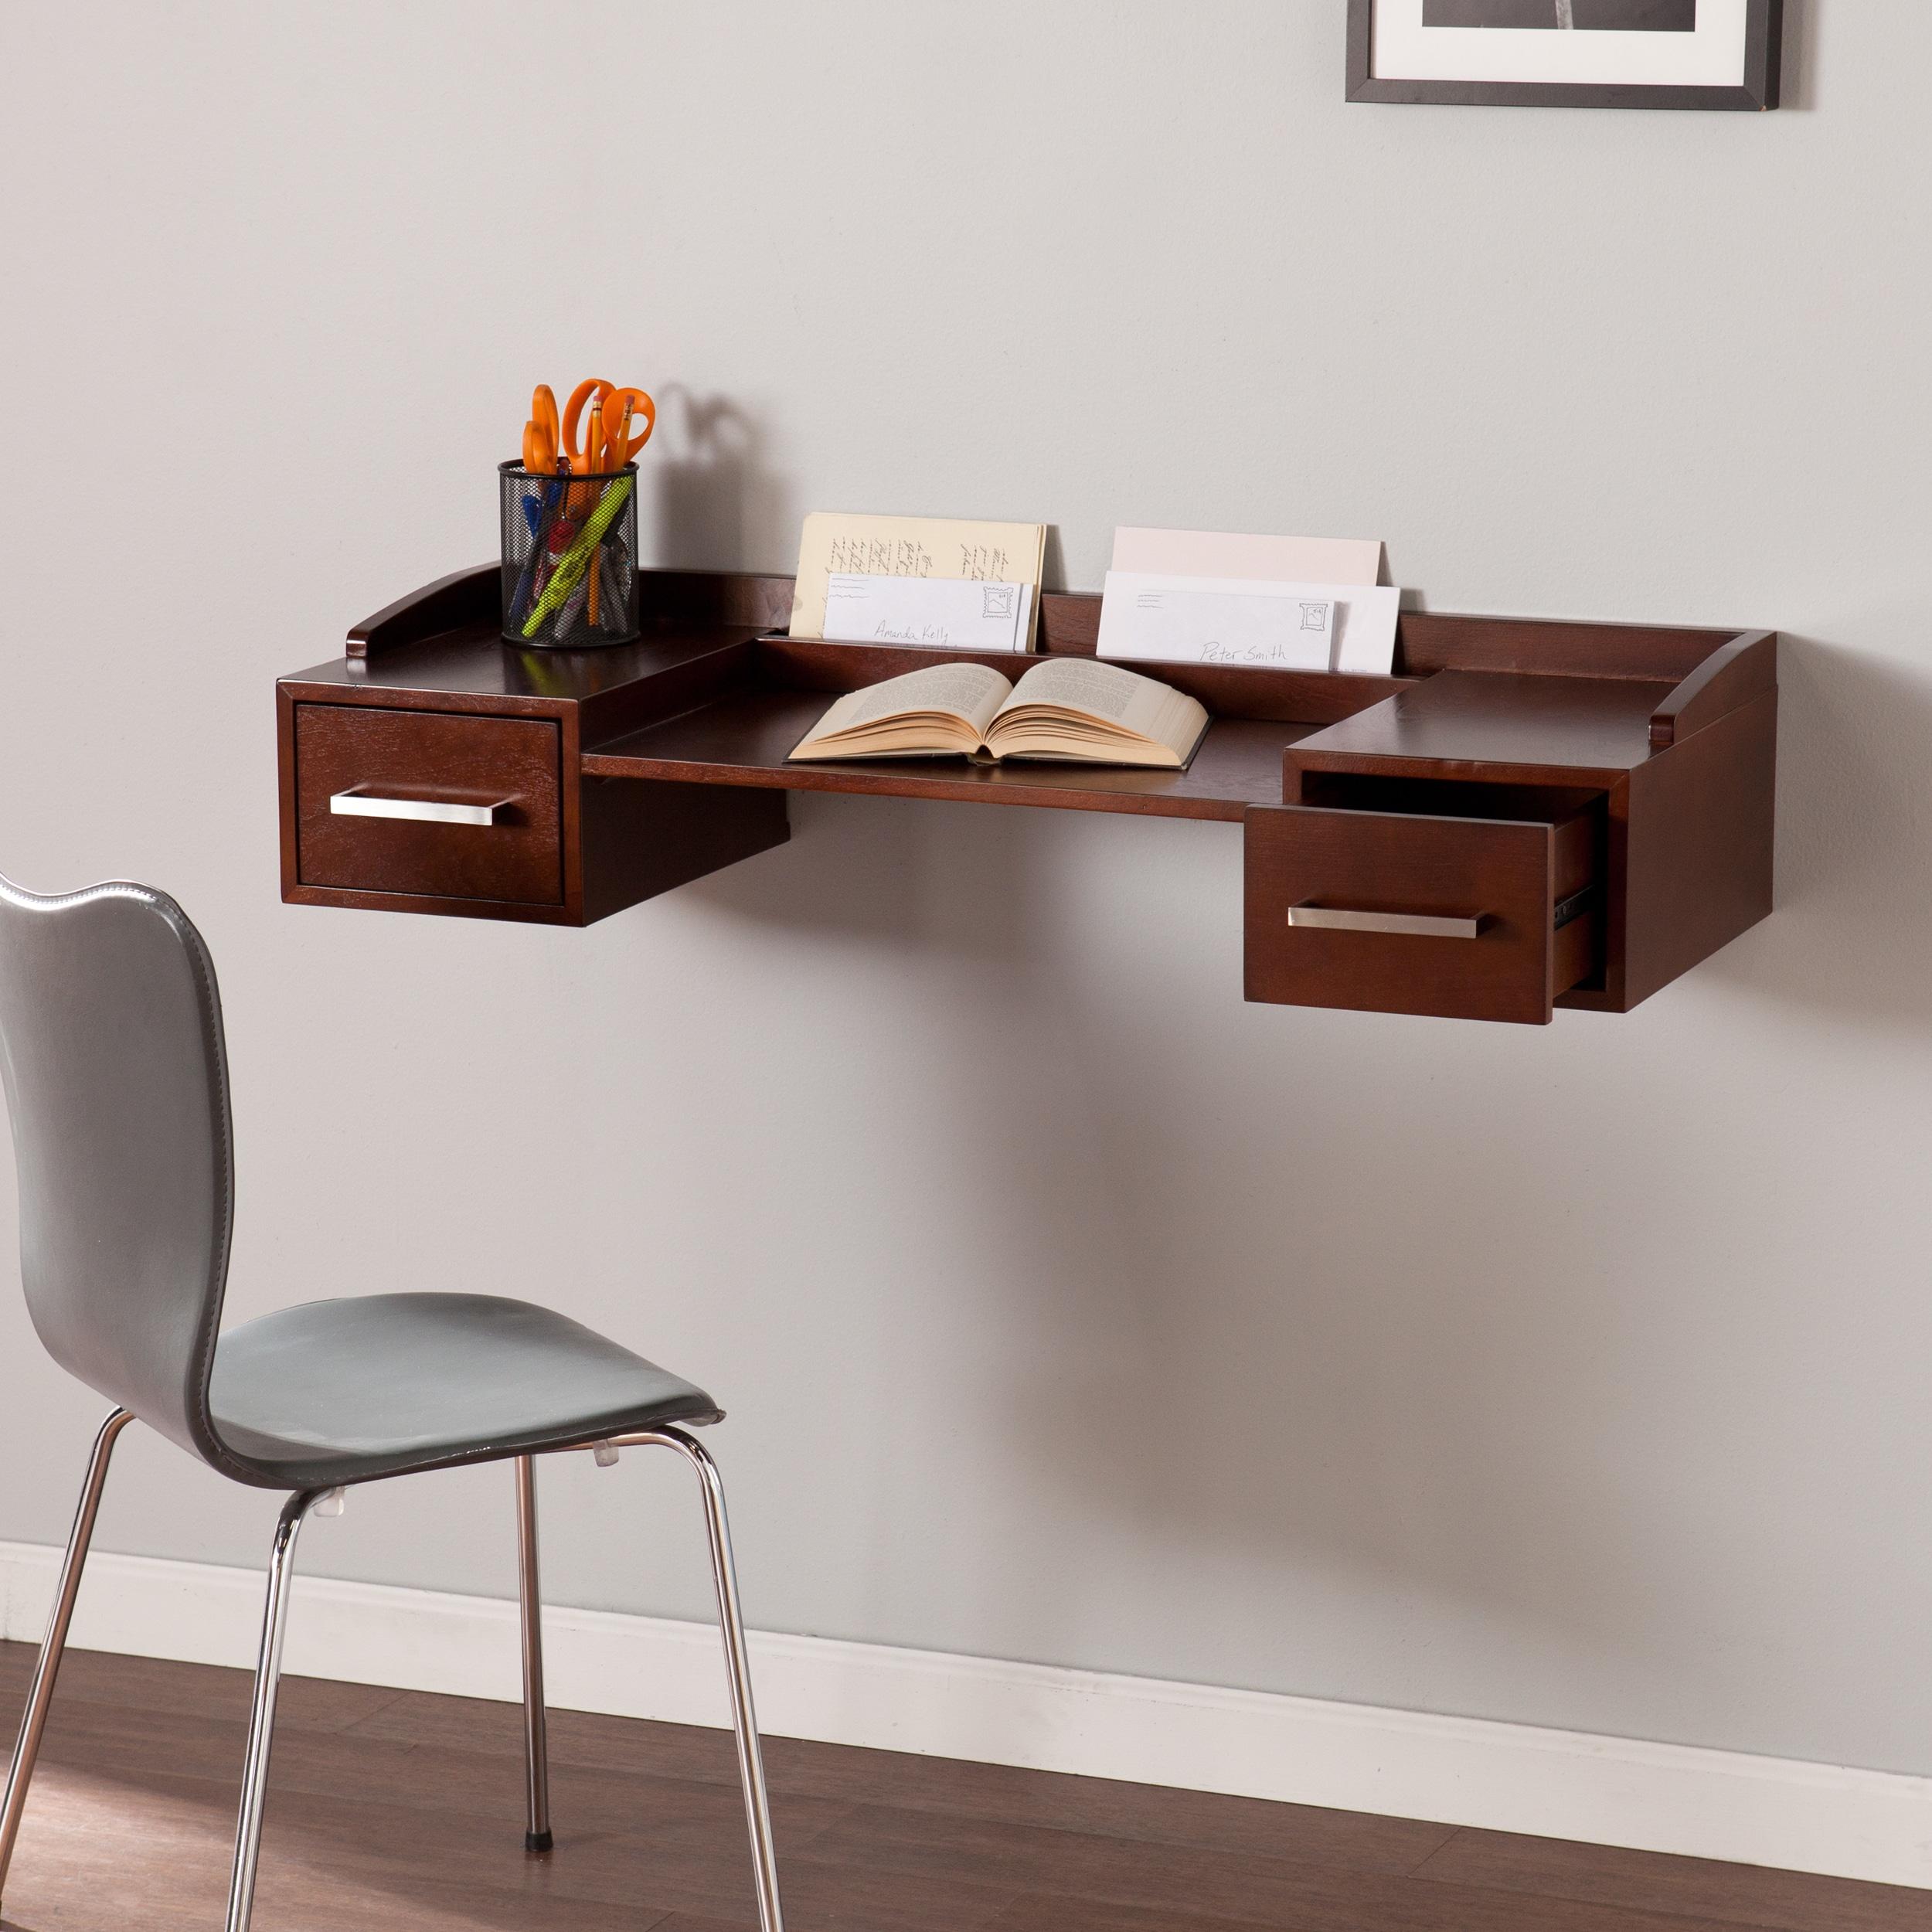 Harper Blvd Bradley Wall Mount Desk (OS1016OH), Brown, Si...